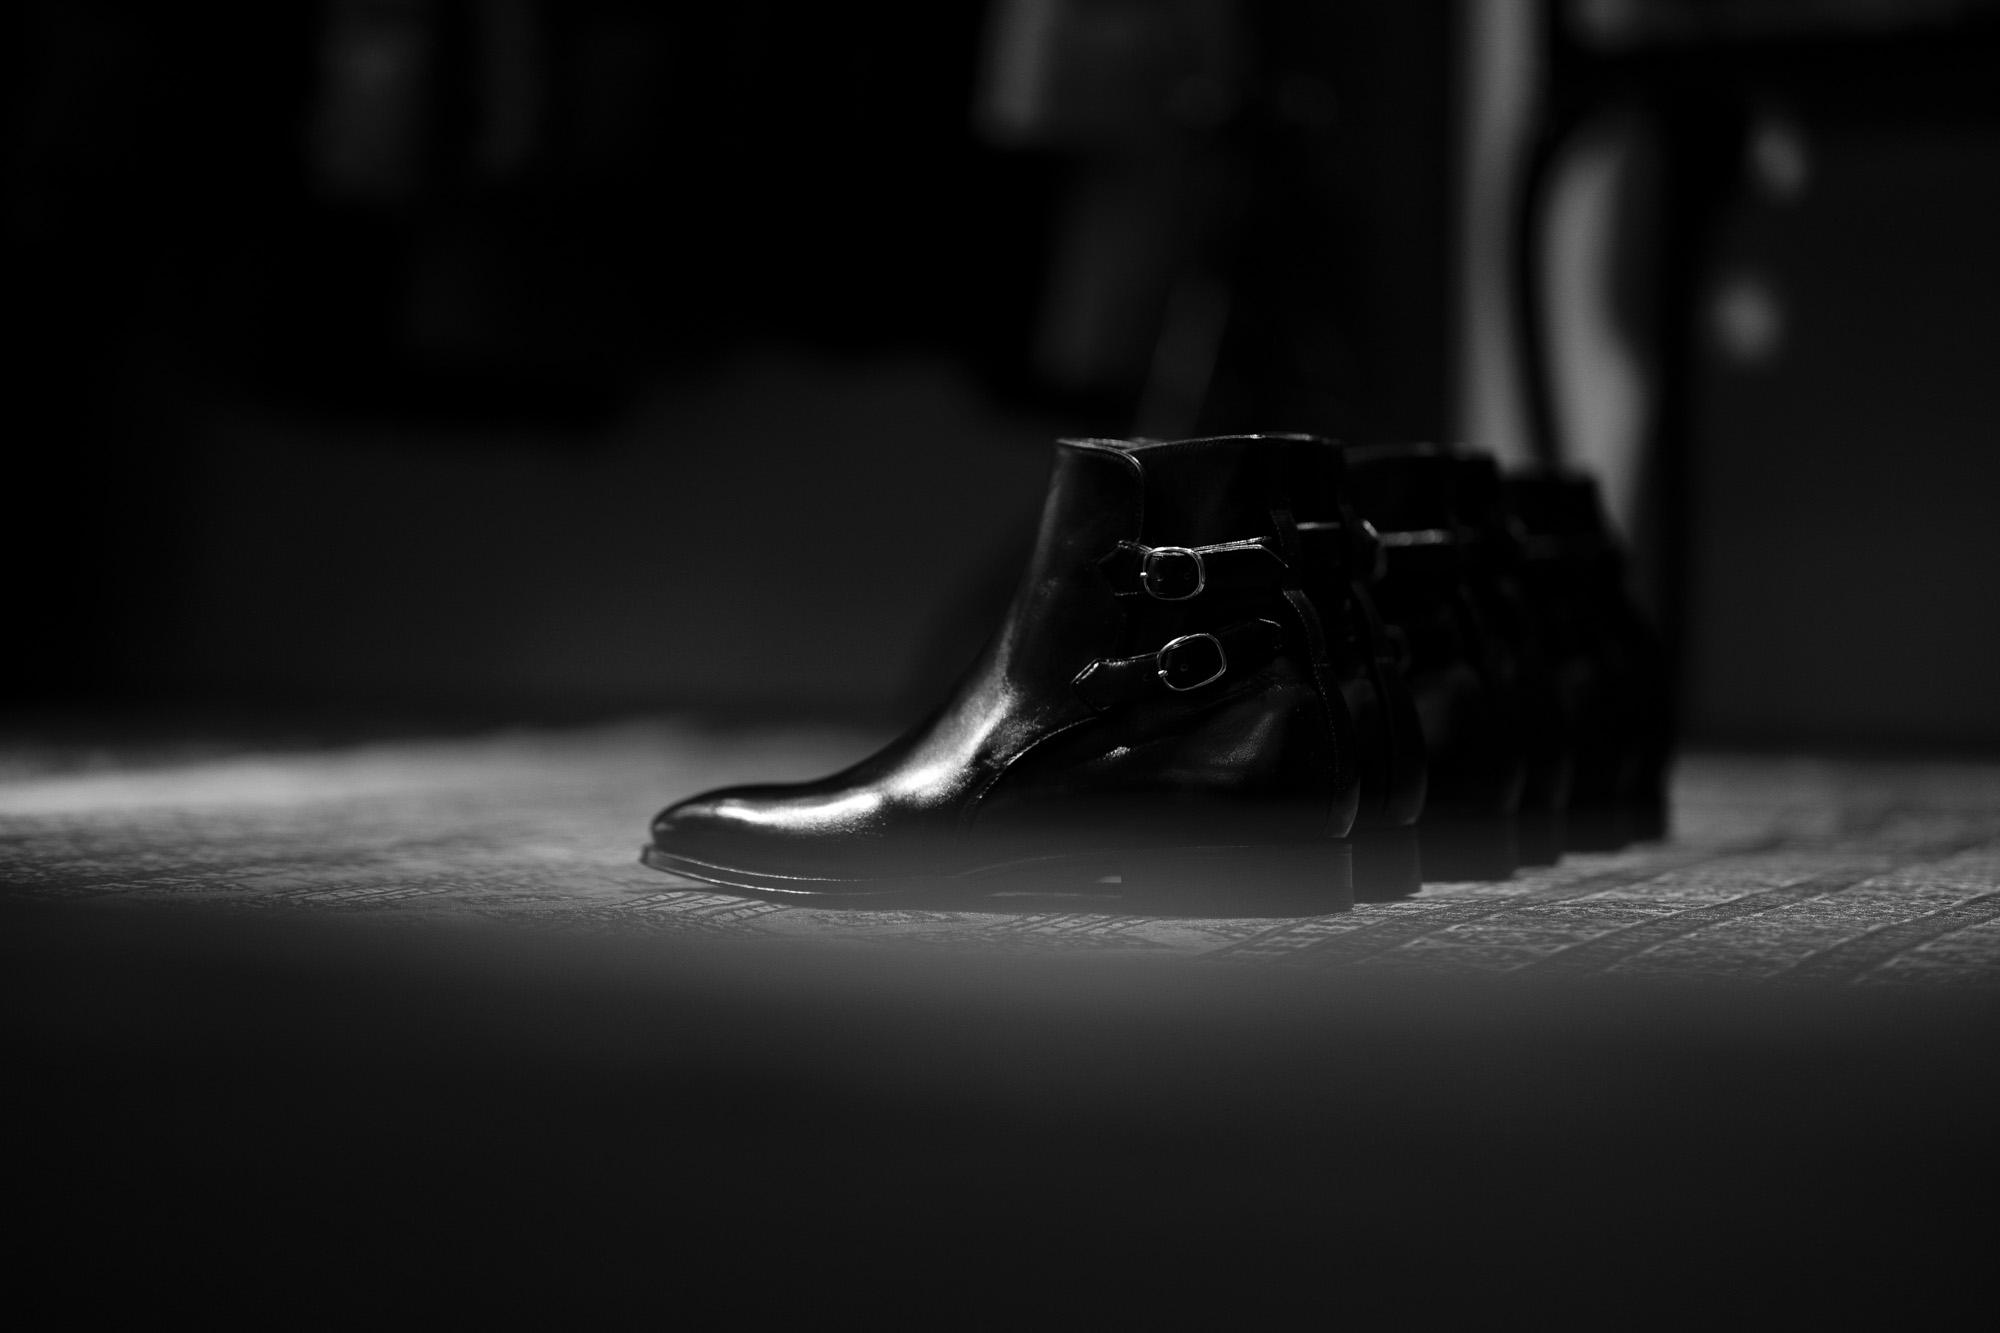 ENZO BONAFE(エンツォボナフェ) ART.3995 Double strap boot Du Puy Vitello デュプイ社ボックスカーフ ダブルストラップブーツ NERO (ブラック) made in italy (イタリア製) 2019 秋冬新作 enzobonafe 愛知 名古屋 Alto e Diritto アルト エ デリット alto e diritto アルトエデリット 5,5.5,6,6.5,7,7.5,8,8.5,9,9.5